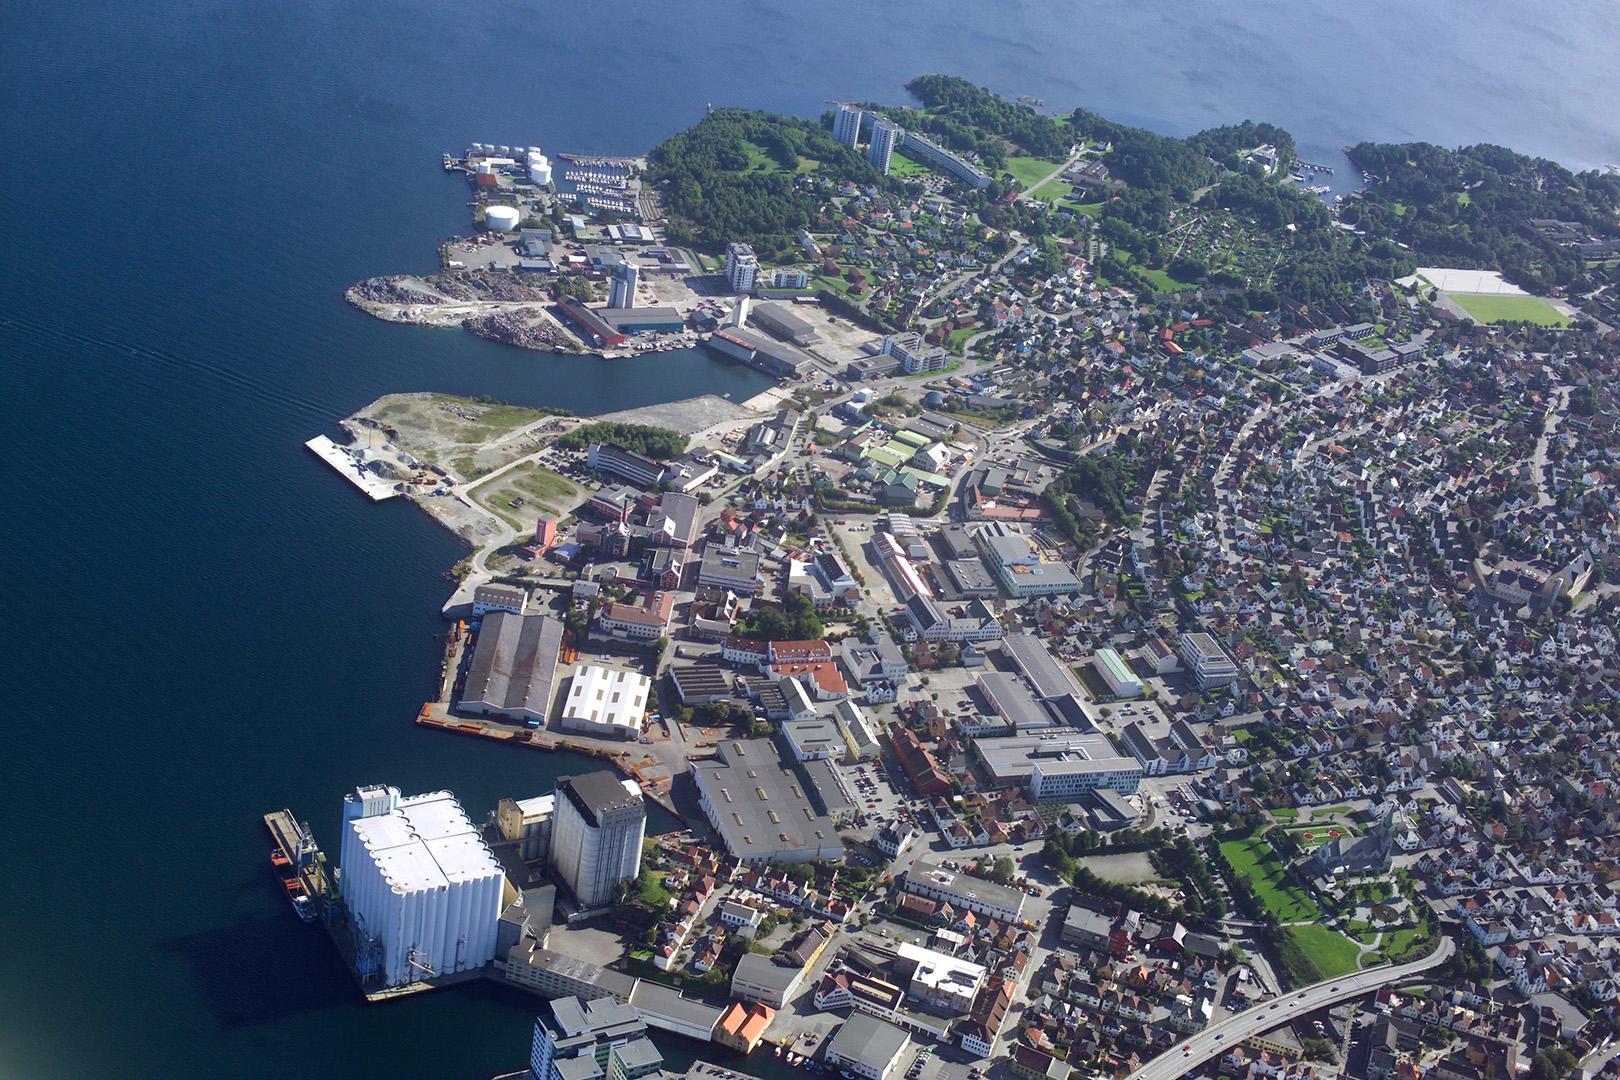 01_aerial-view_Stavanger